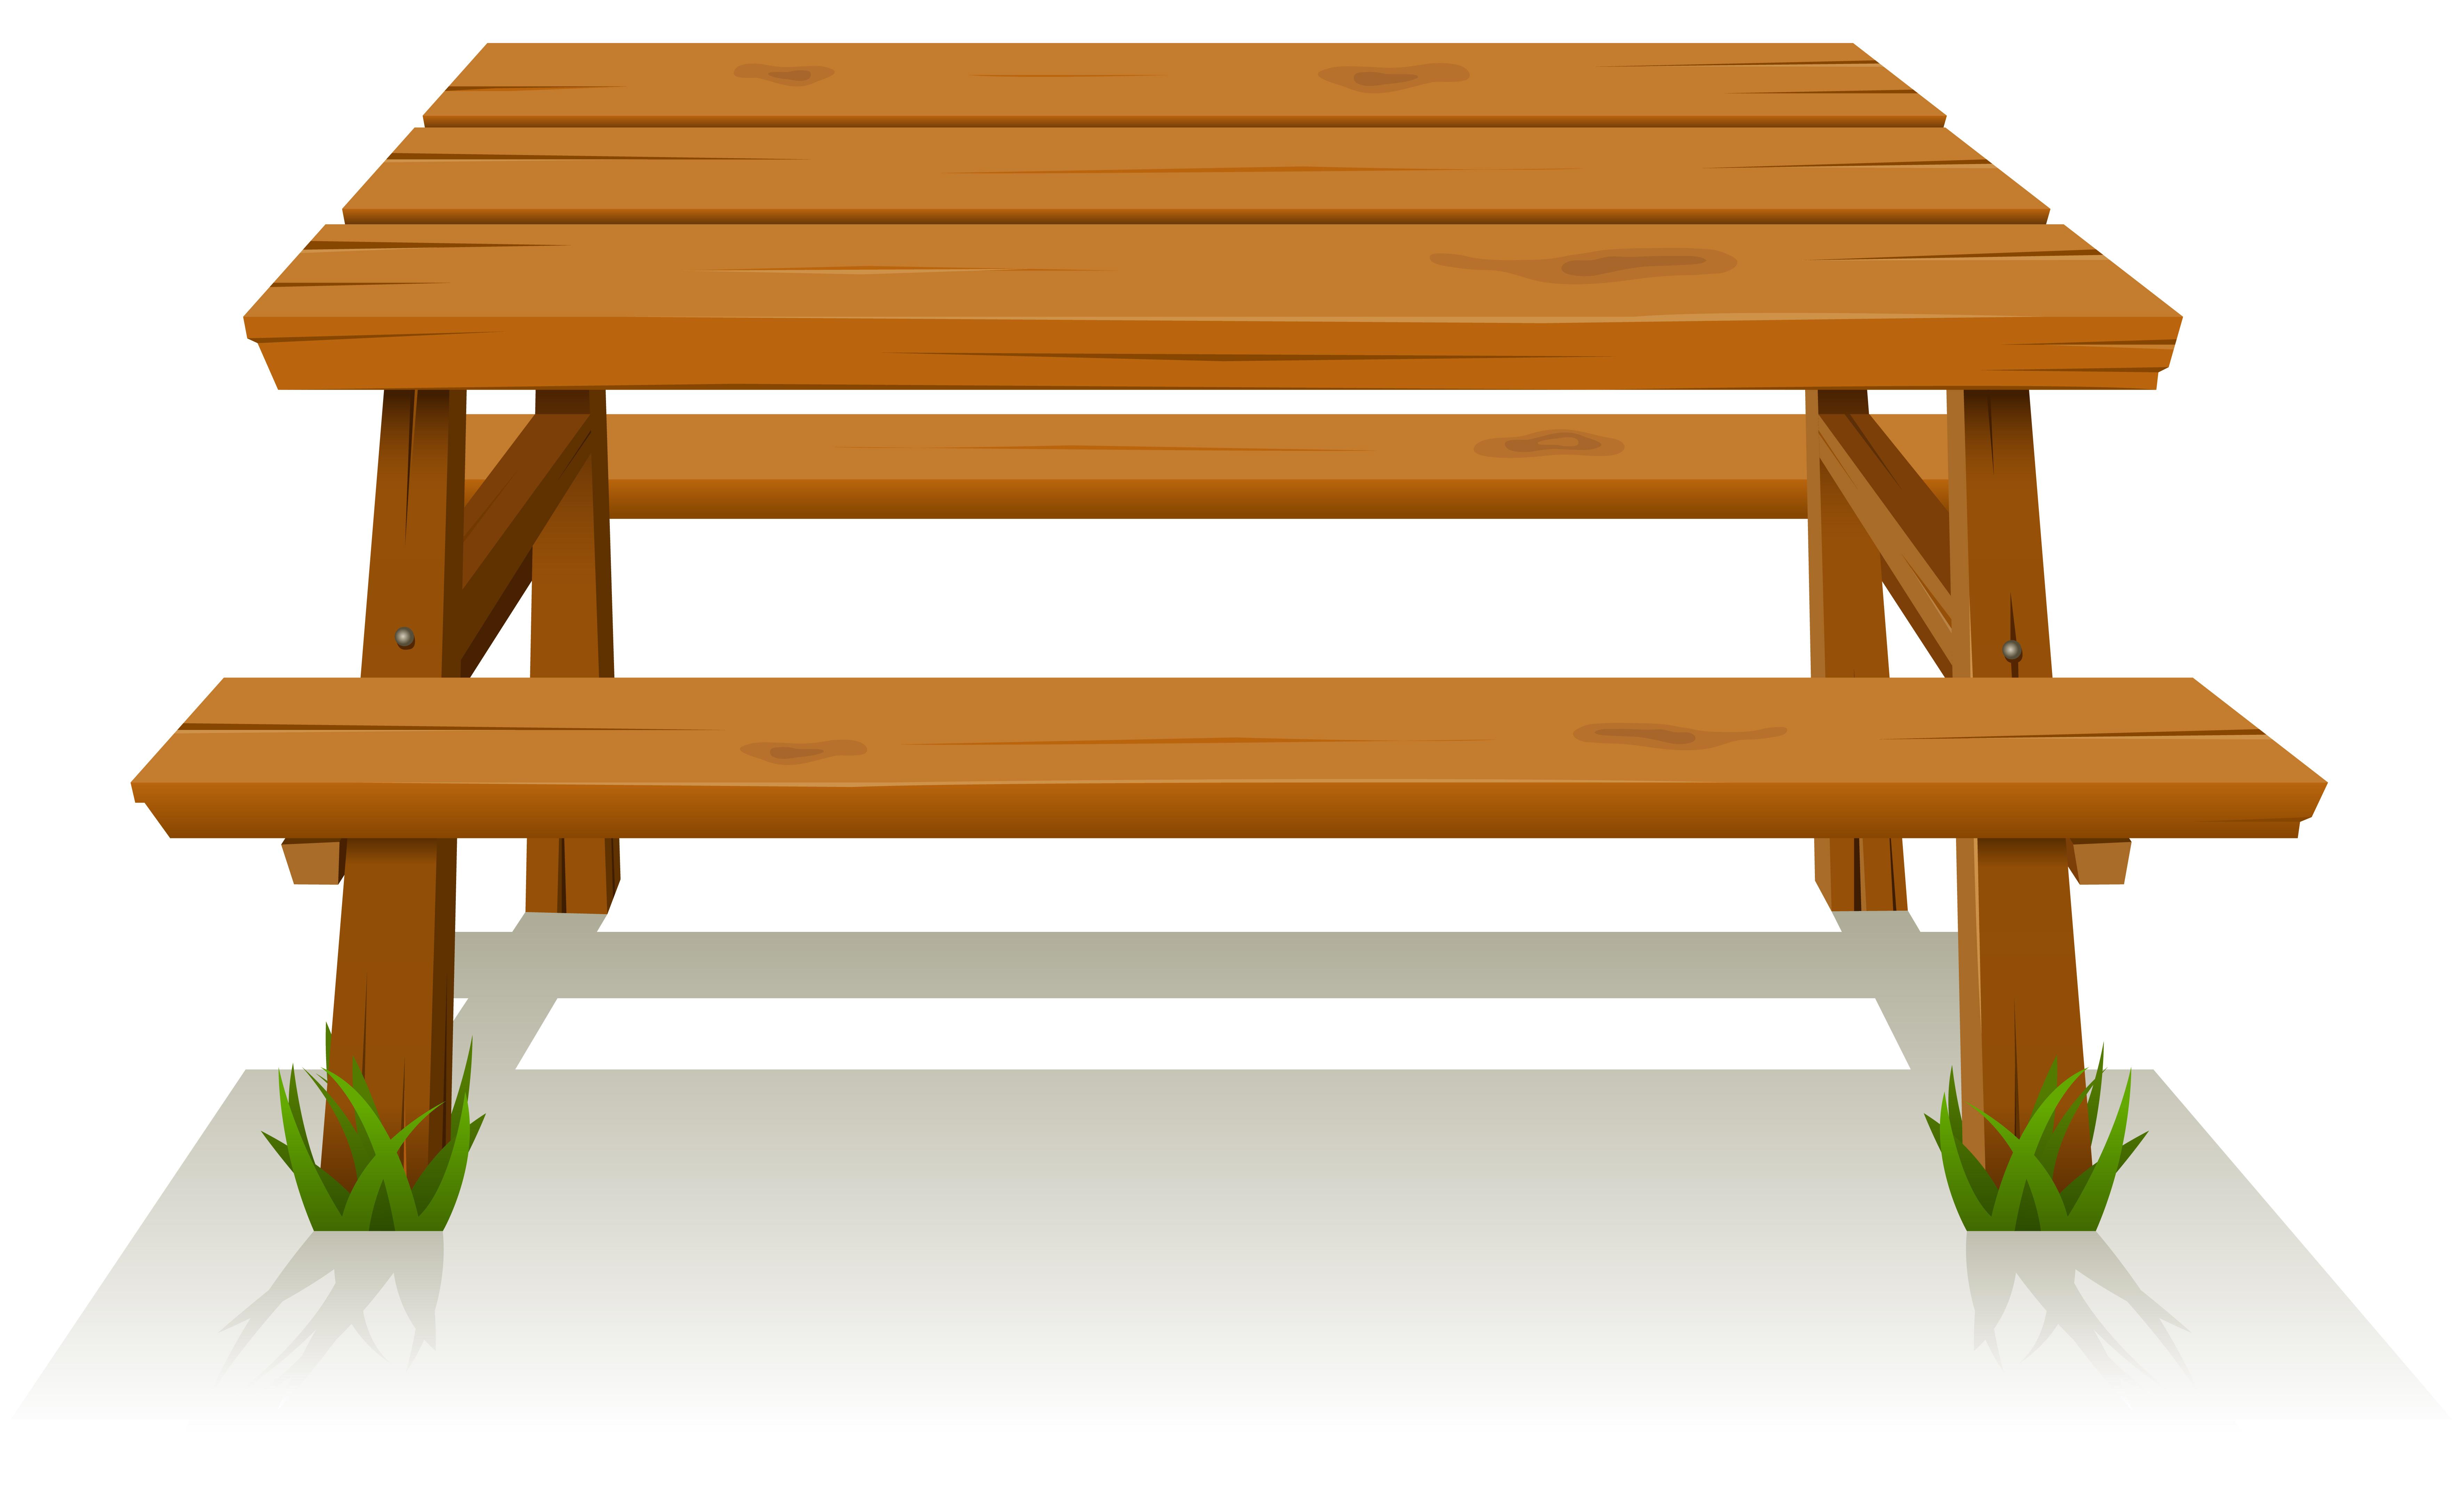 picnic wood table download free vector art stock. Black Bedroom Furniture Sets. Home Design Ideas